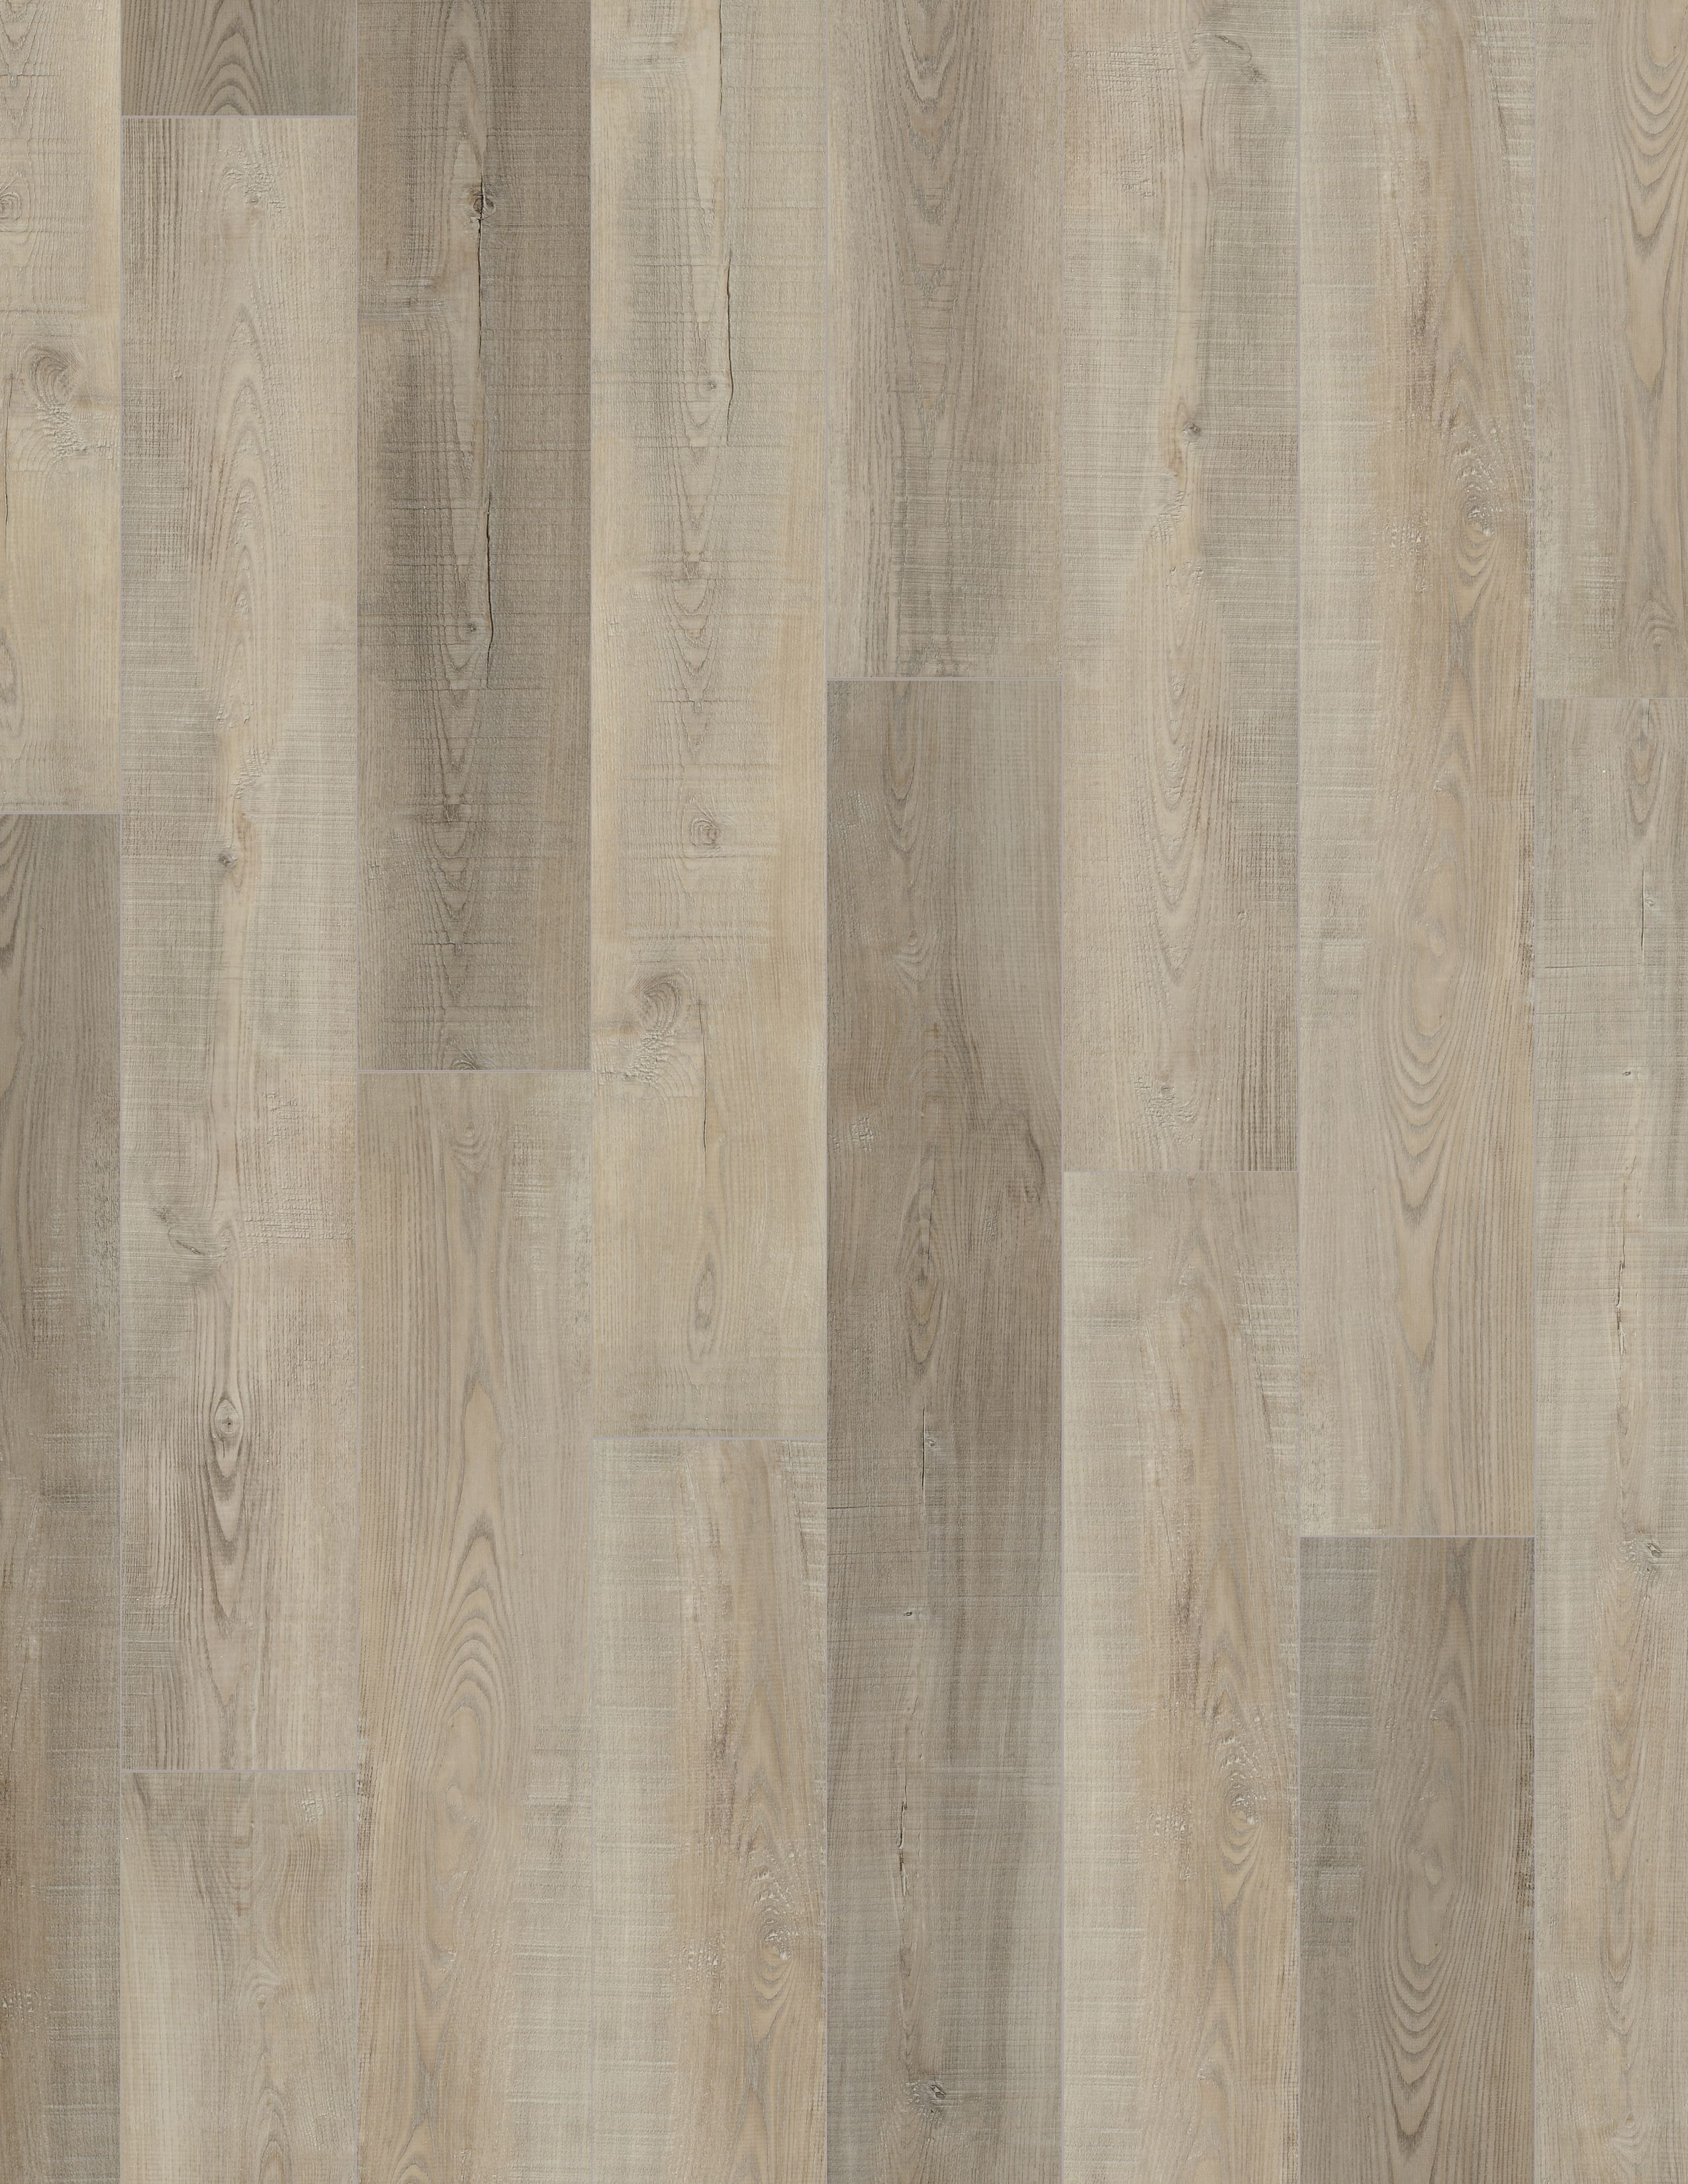 Us Floors Coretec Plus Enhanced 7 Plank Vv012 00754 Mata Oak Flooring Vinyl Plank Flooring Vinyl Plank